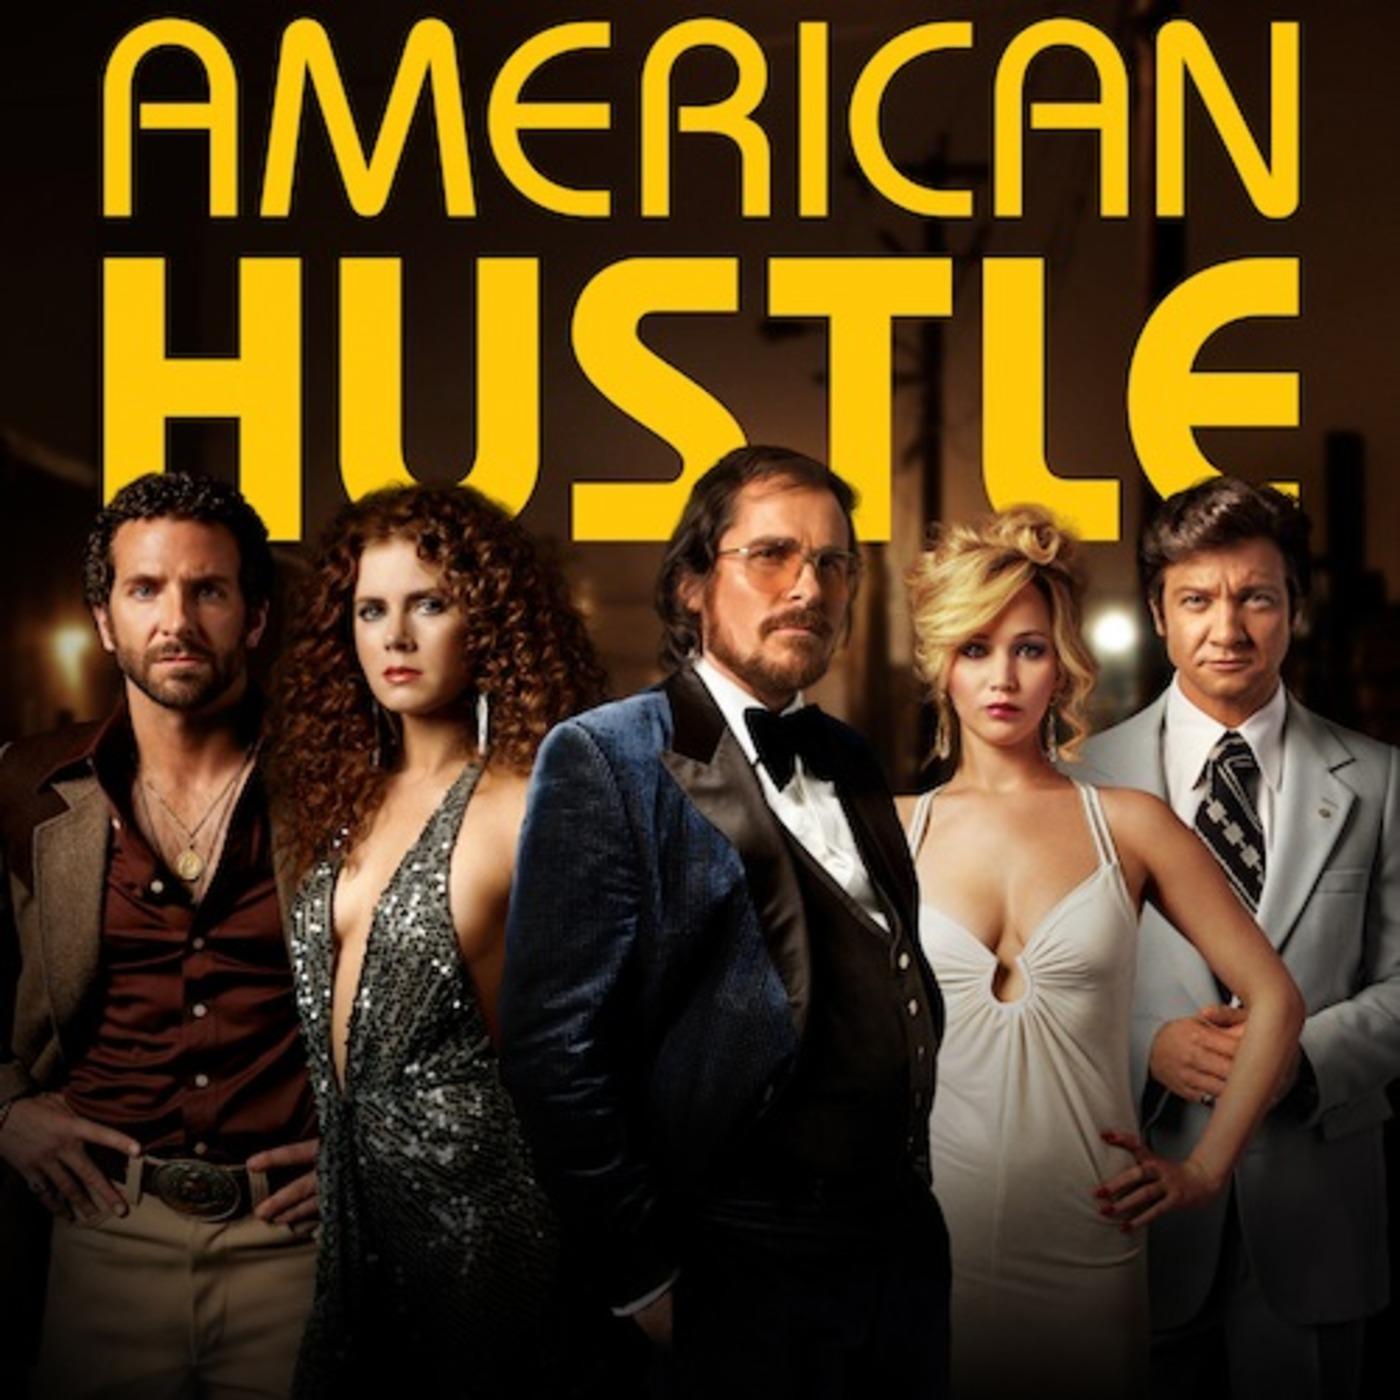 Alessandro nivola american hustle